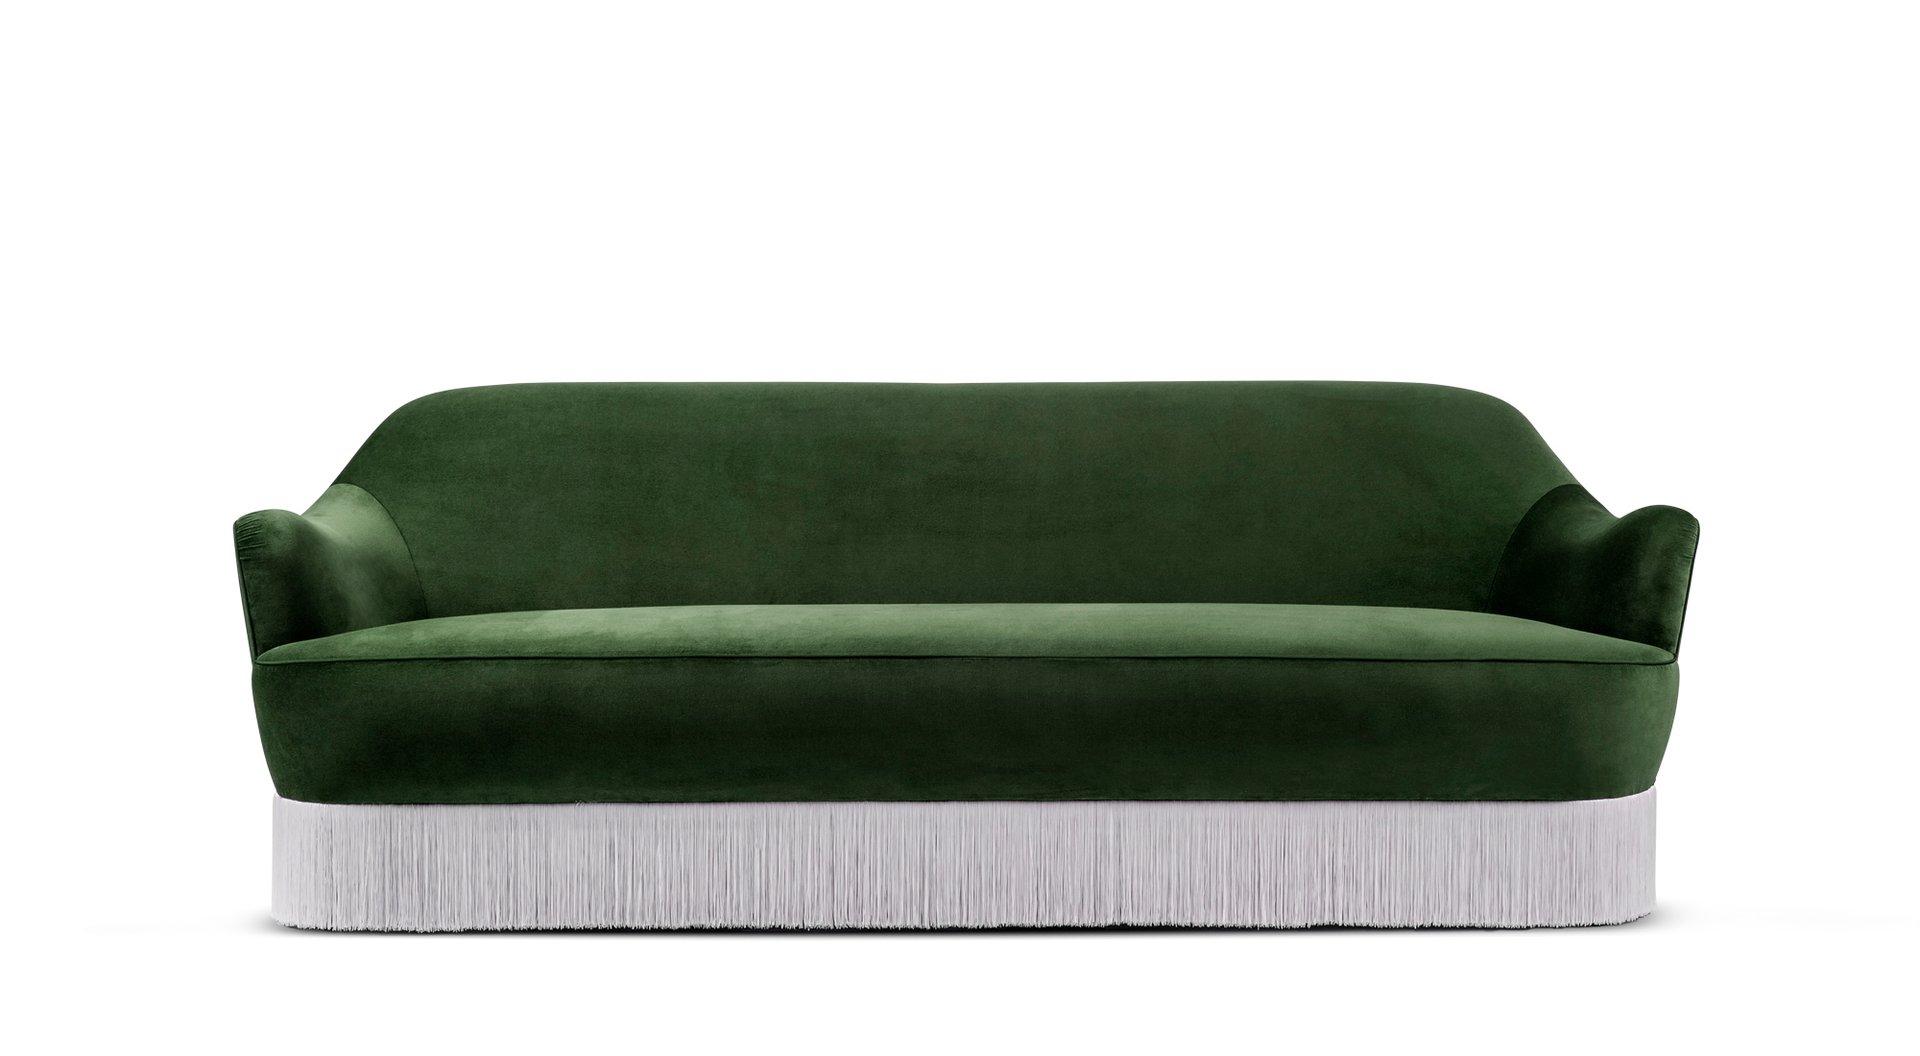 Ecksofa designklassiker  Design Sofas online kaufen bei Pamono